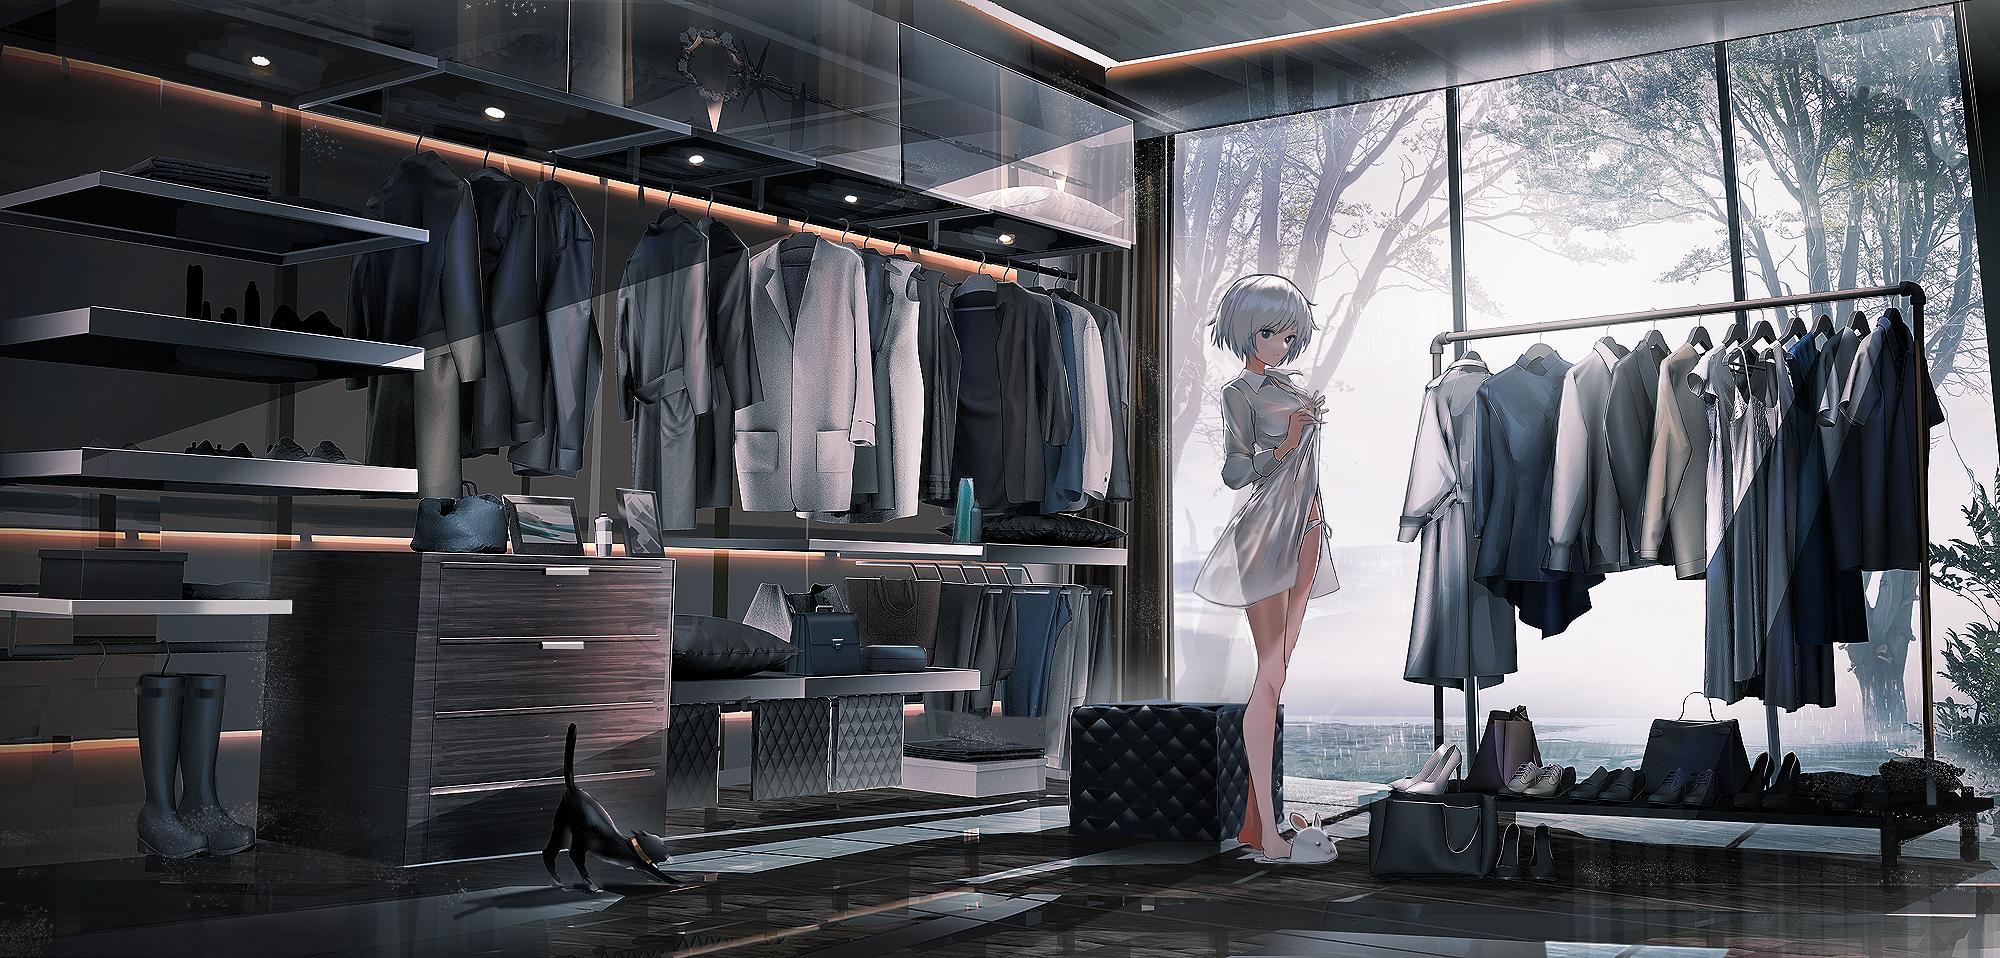 【P站画师】帅气的少女们!日本画师SWAV的插画作品- ACG17.COM